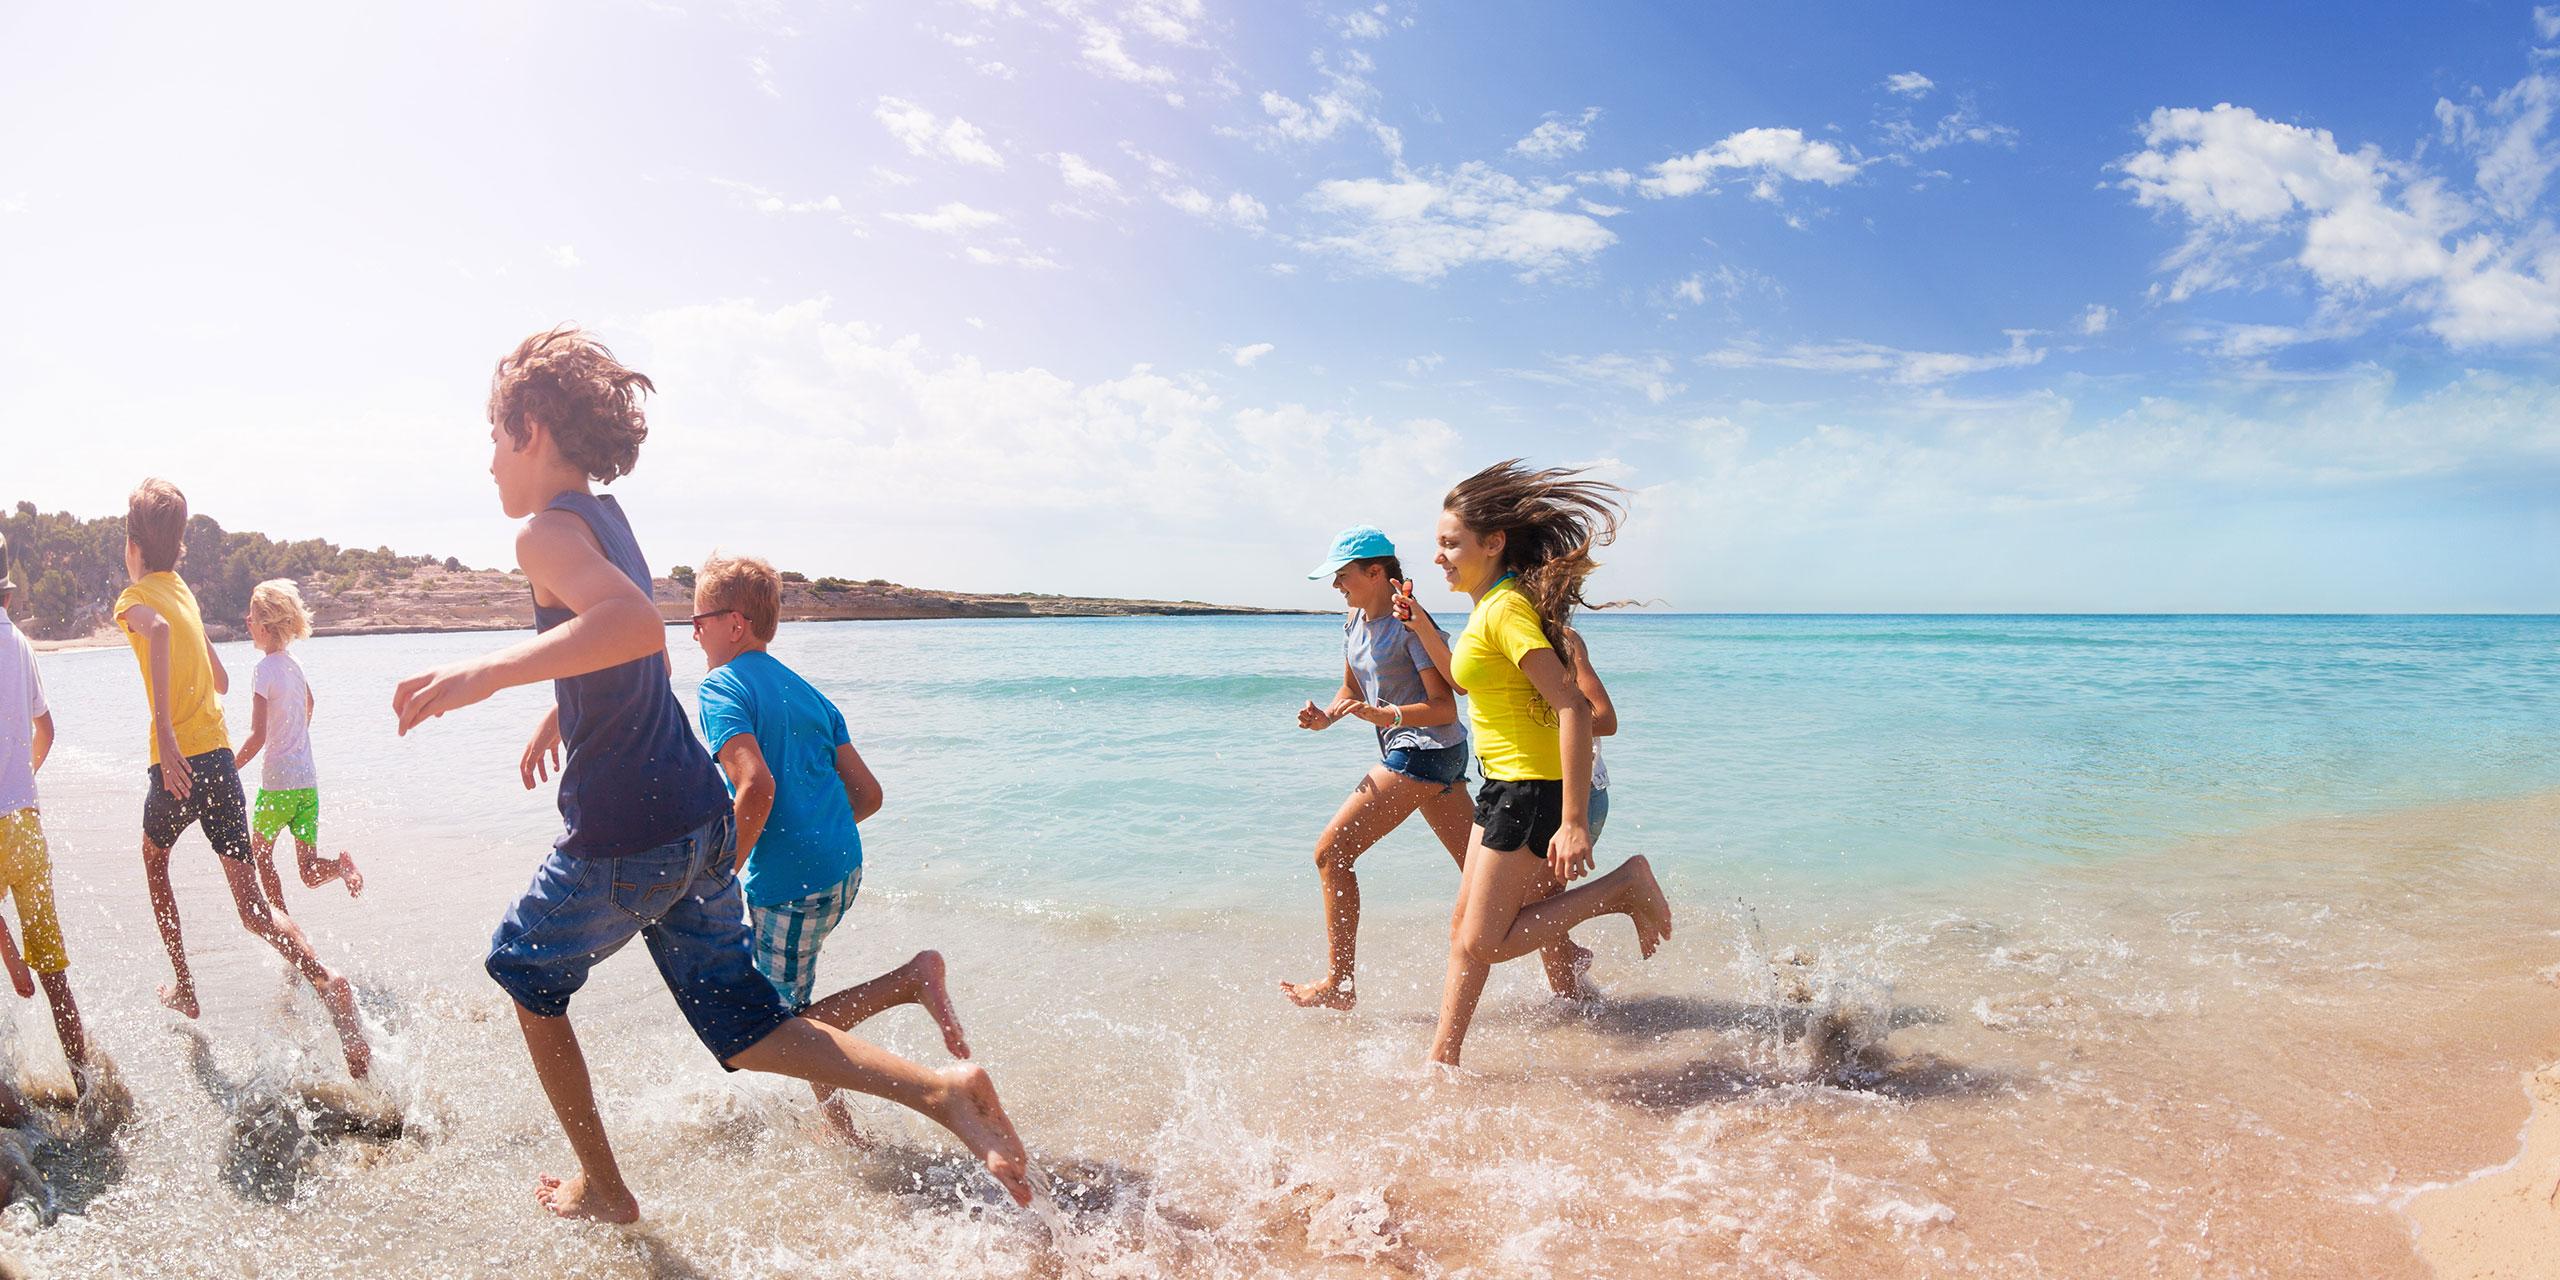 Teens and Tweens Running on Beach; Courtesy of Sergey Novikov/Shutterstock.com